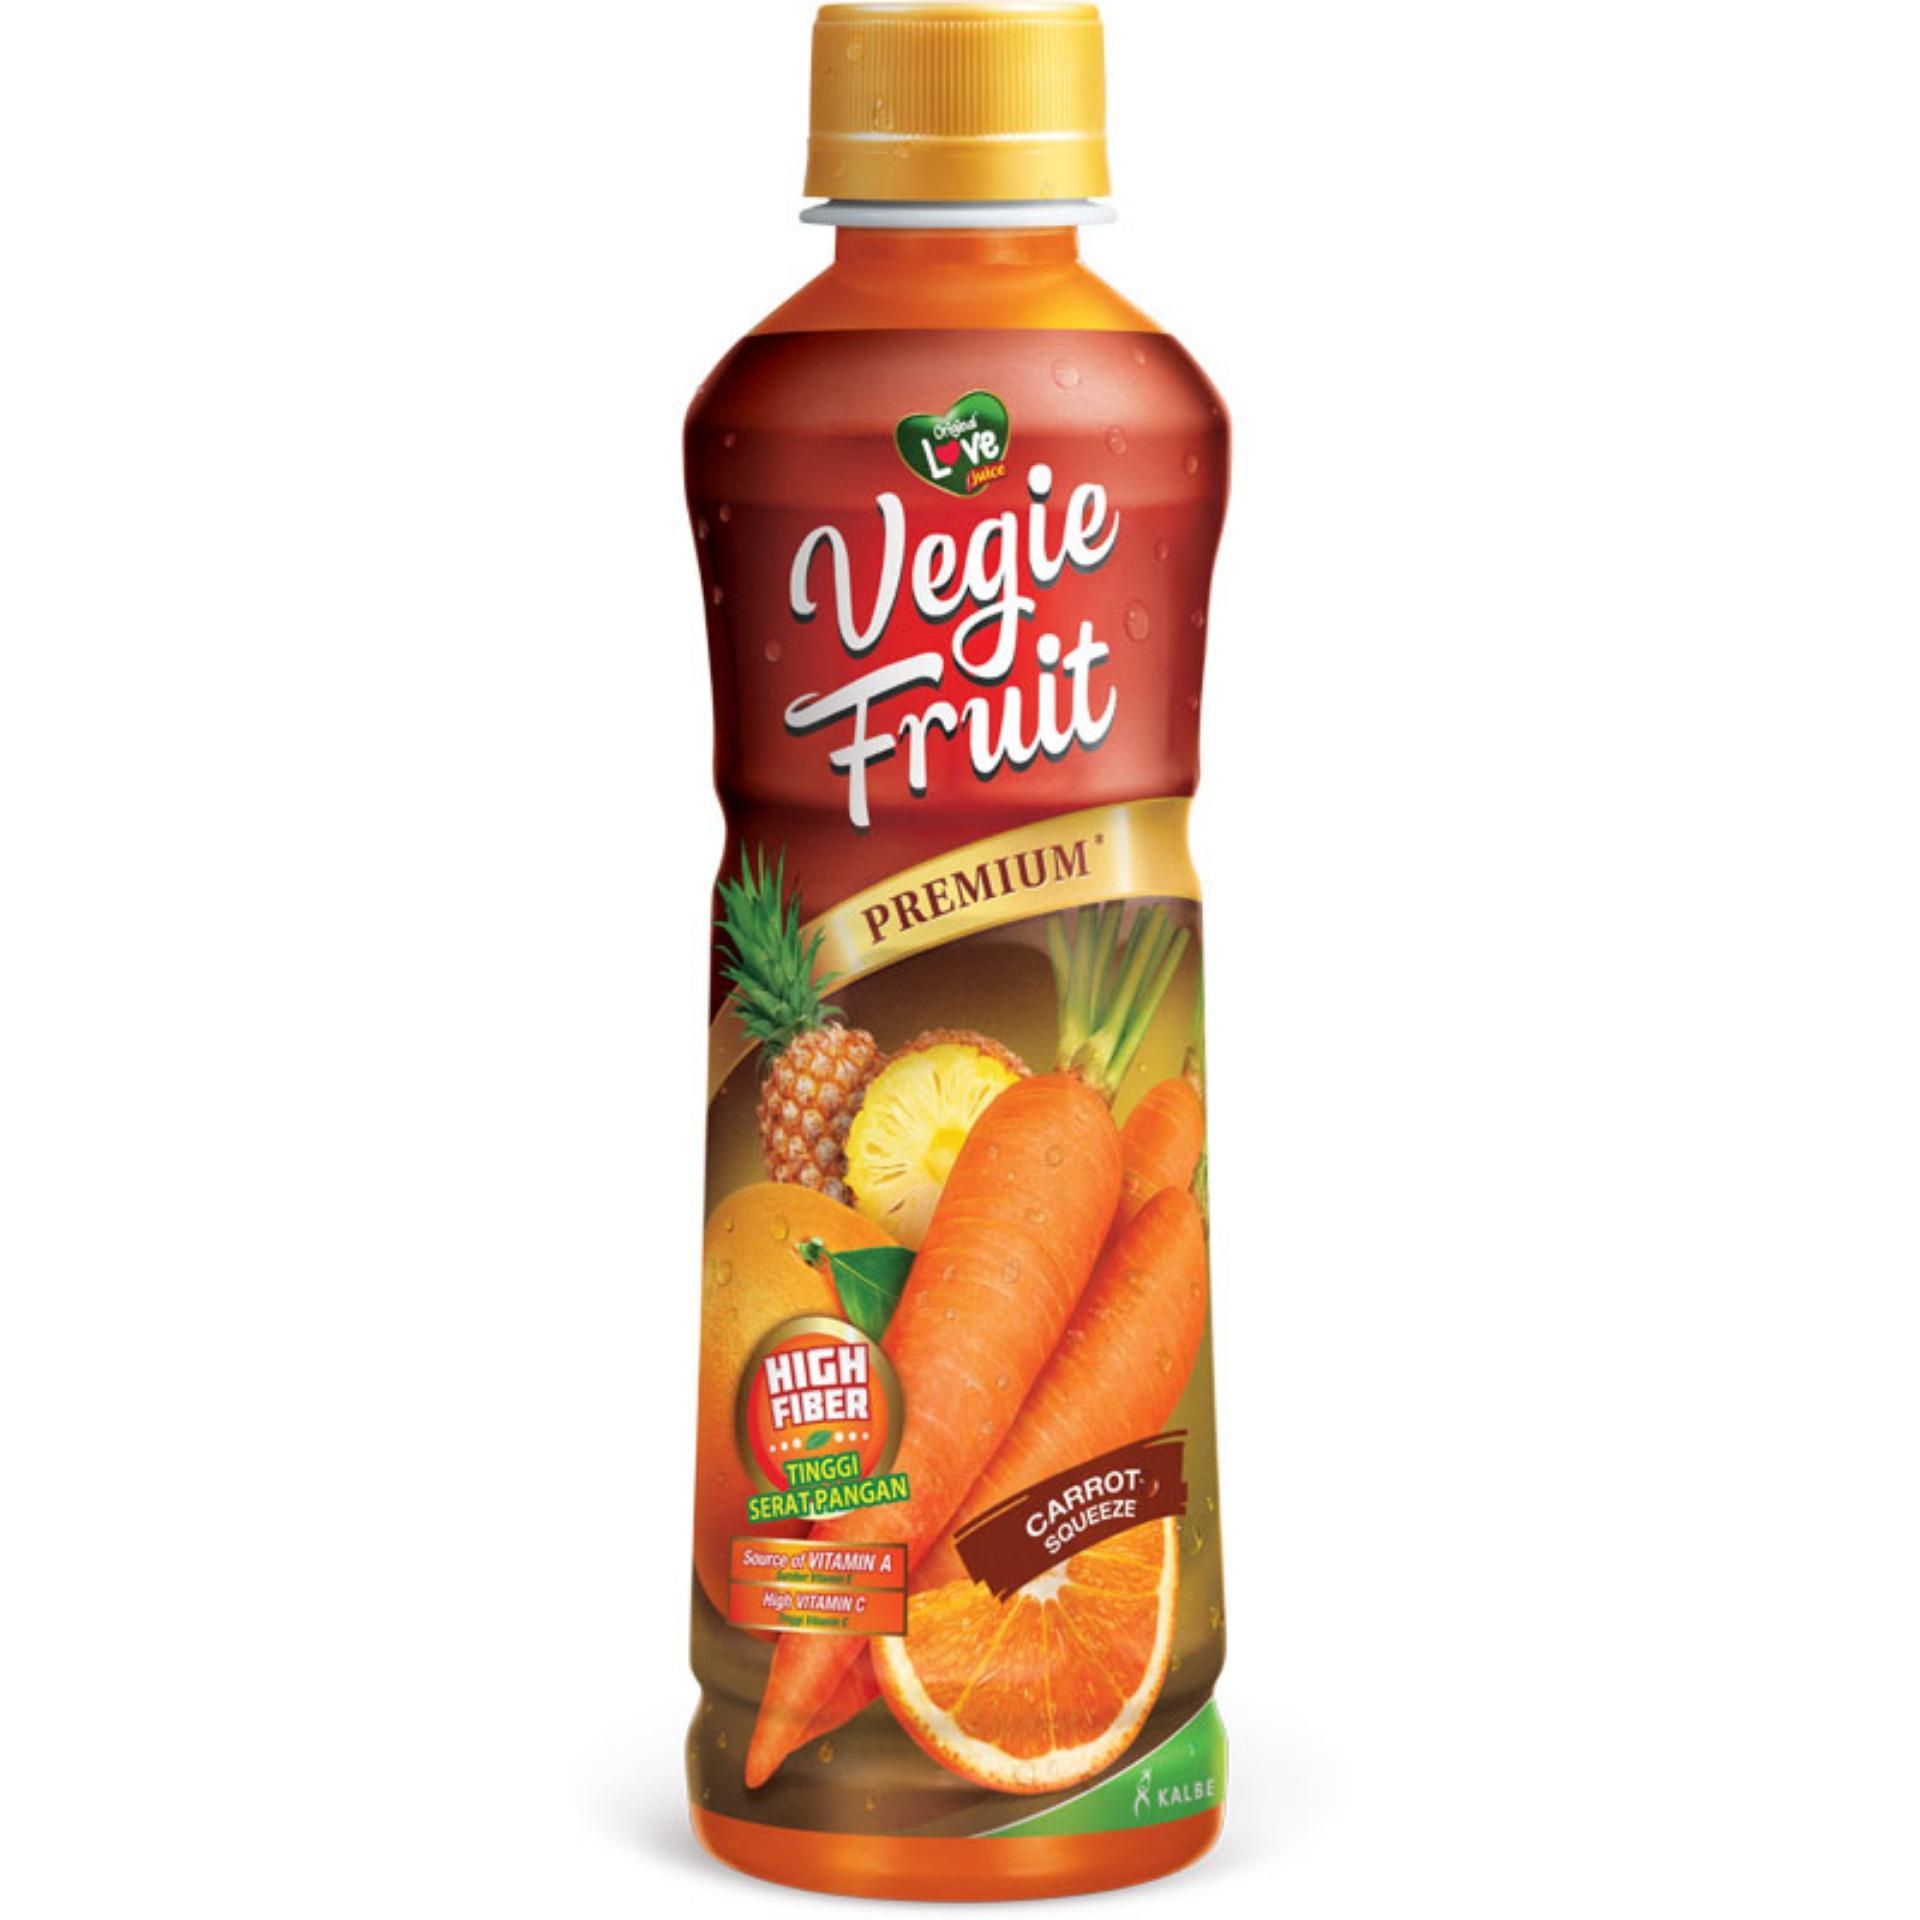 Curcuma Plus Fruit Vegie Blackcurrant 100ml Produk Terbaik Wiki Sharpy 60 Ml Love Juice Premium Carrot Squeeze 300ml